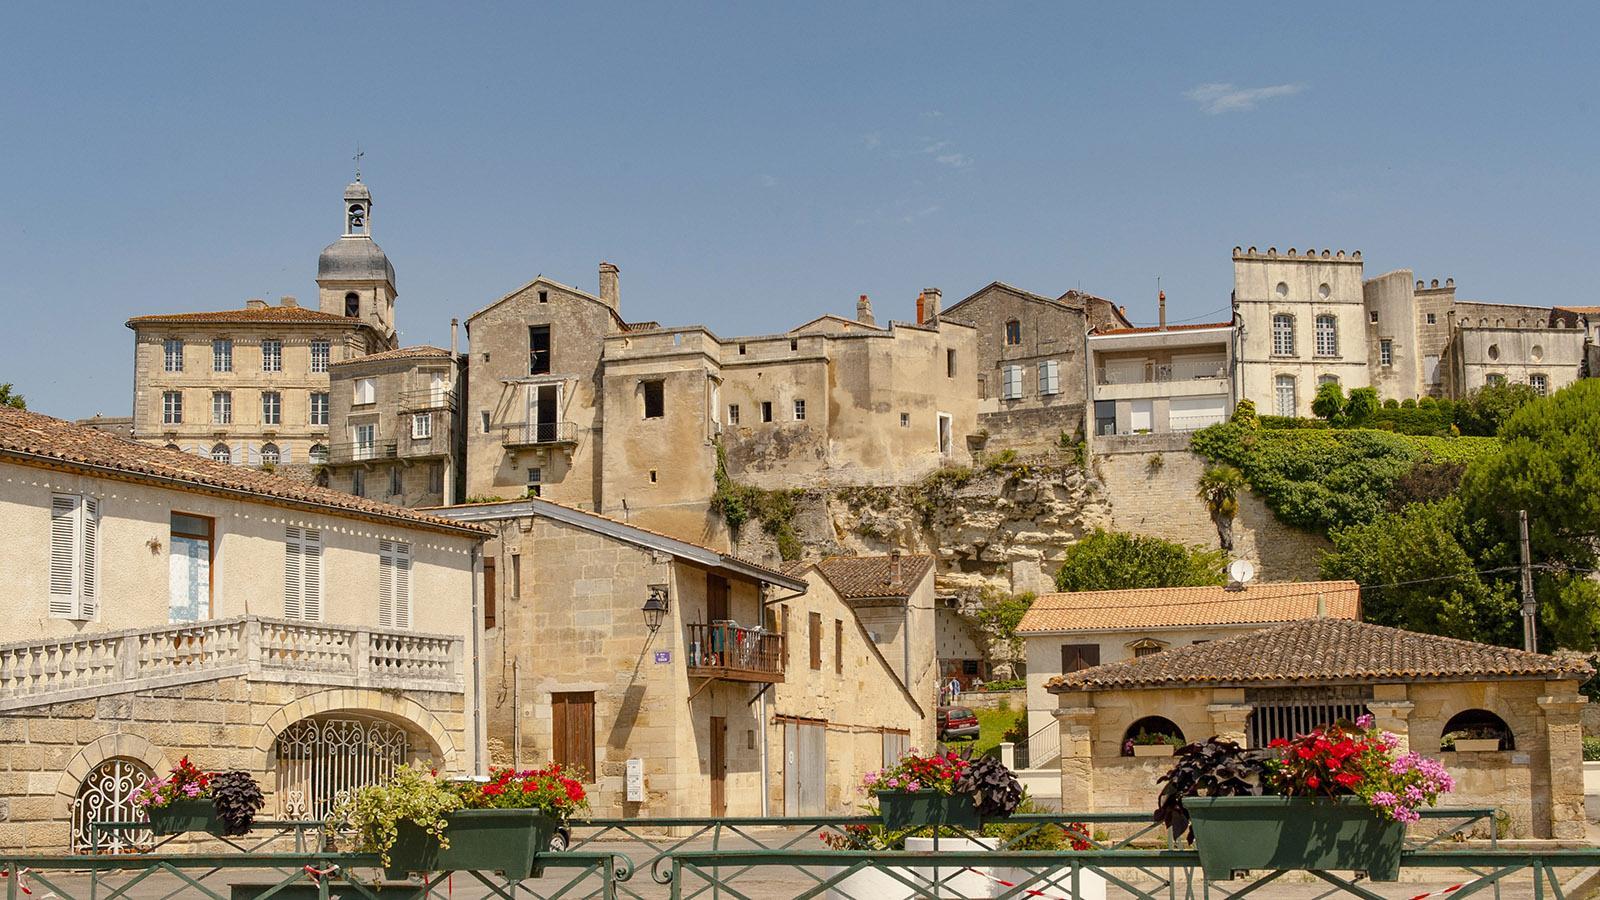 Bourg-sur-Gironde. Foto: Hilke Maunder